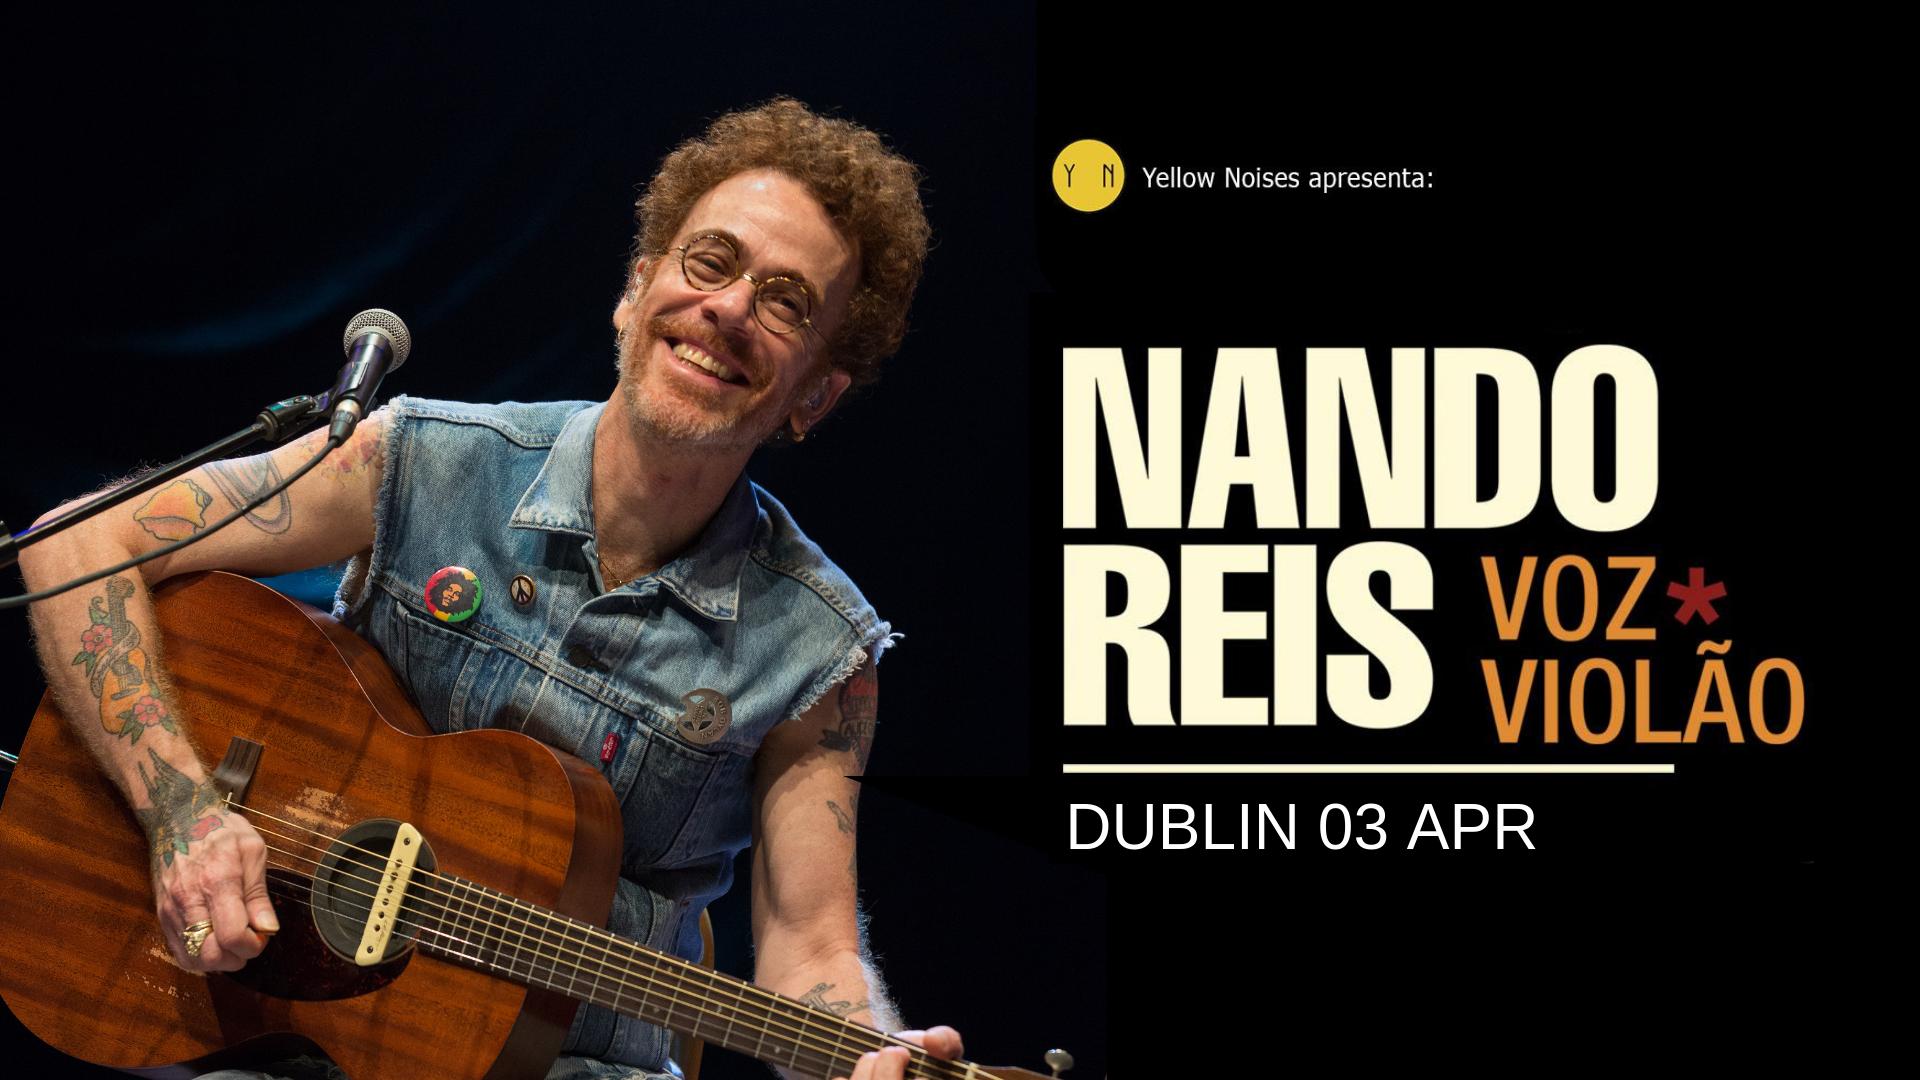 Nando Reis - Dublin